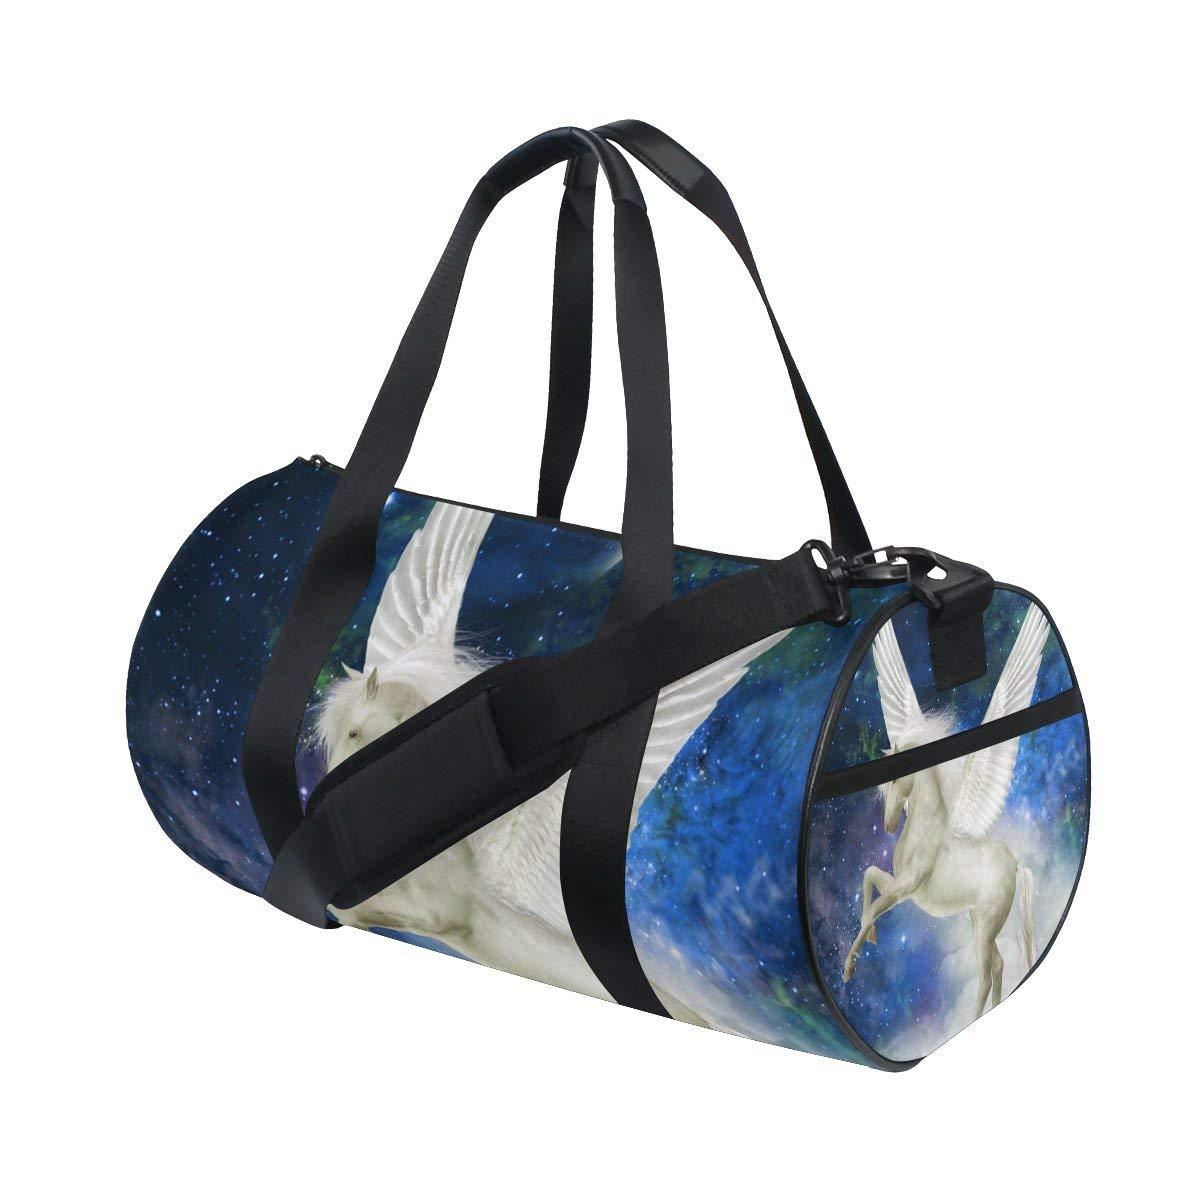 ed4100f253 Get Quotations · ALIREA Unicorn Duffle bag Shoulder Handy Sports Gym Bags  for Men and Women